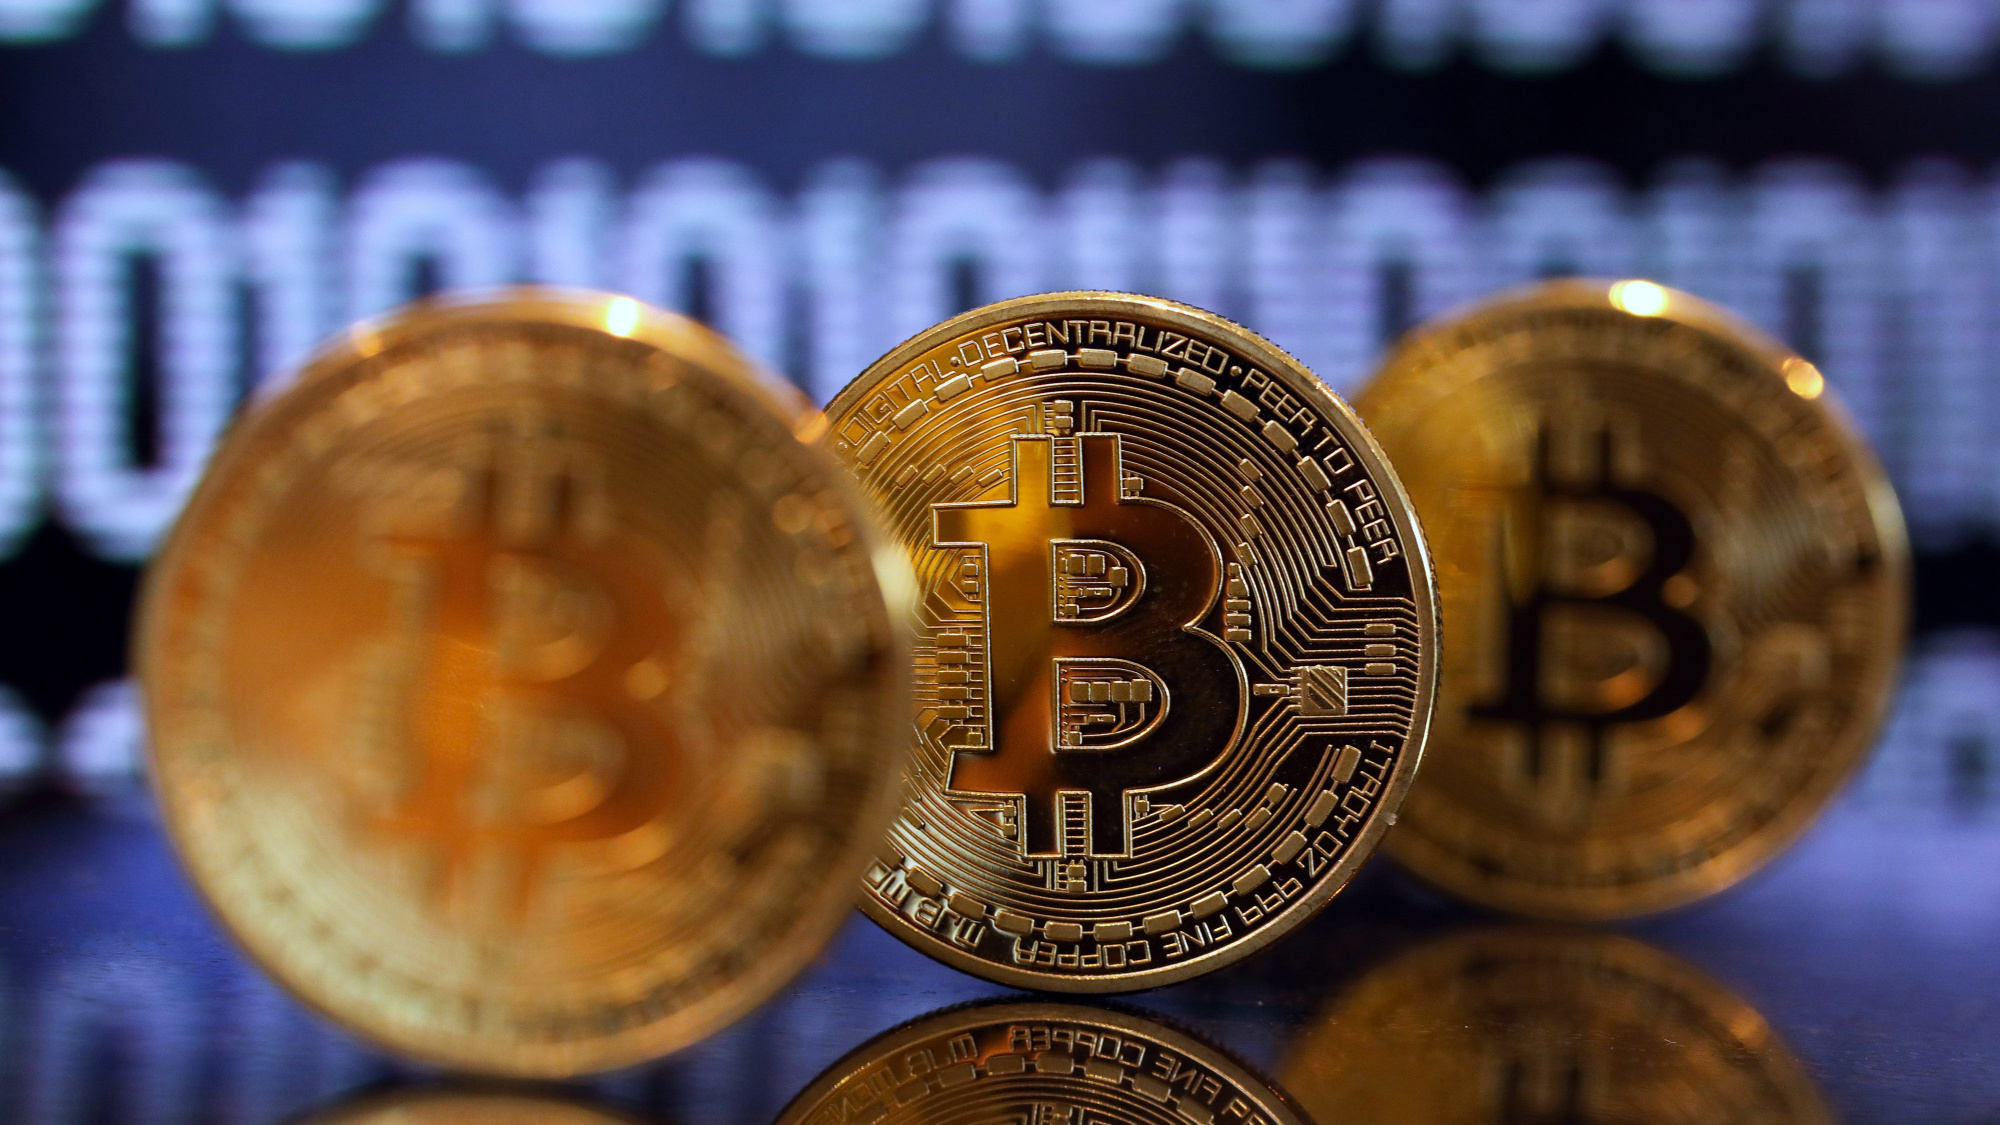 Bitcoin Exchange Had Too Many Bitcoins